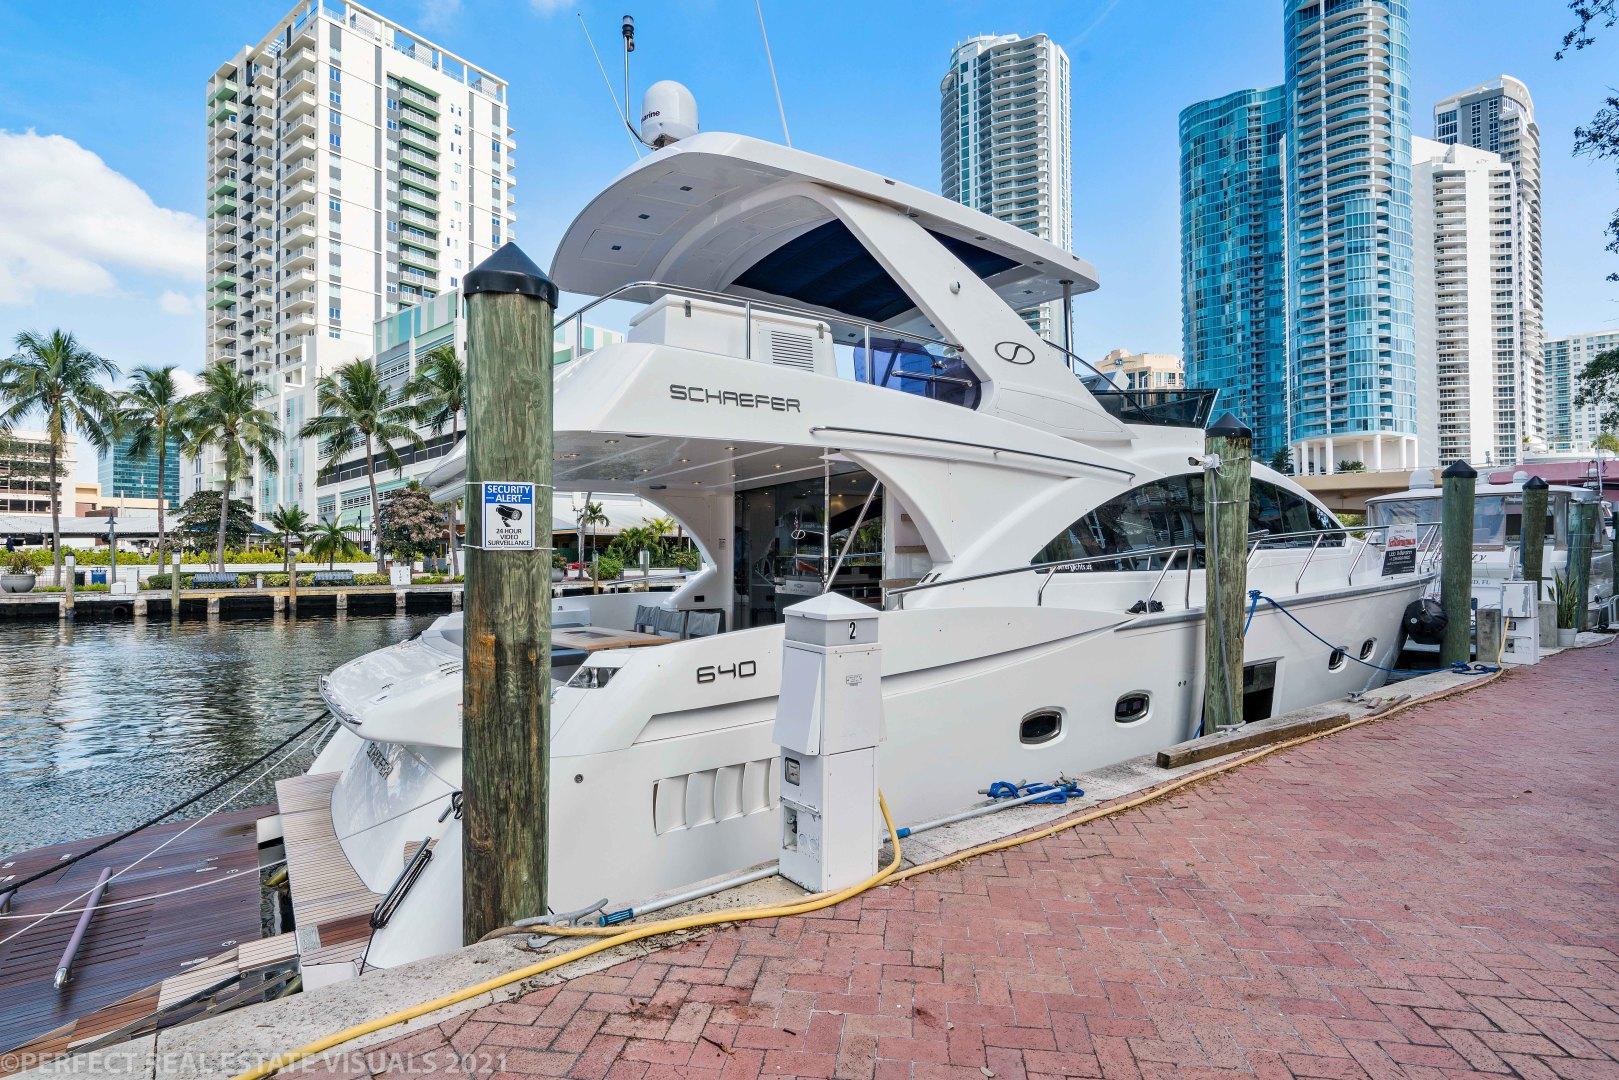 Schaefer-640 2017 -Fort Lauderdale-United States-1600567 | Thumbnail